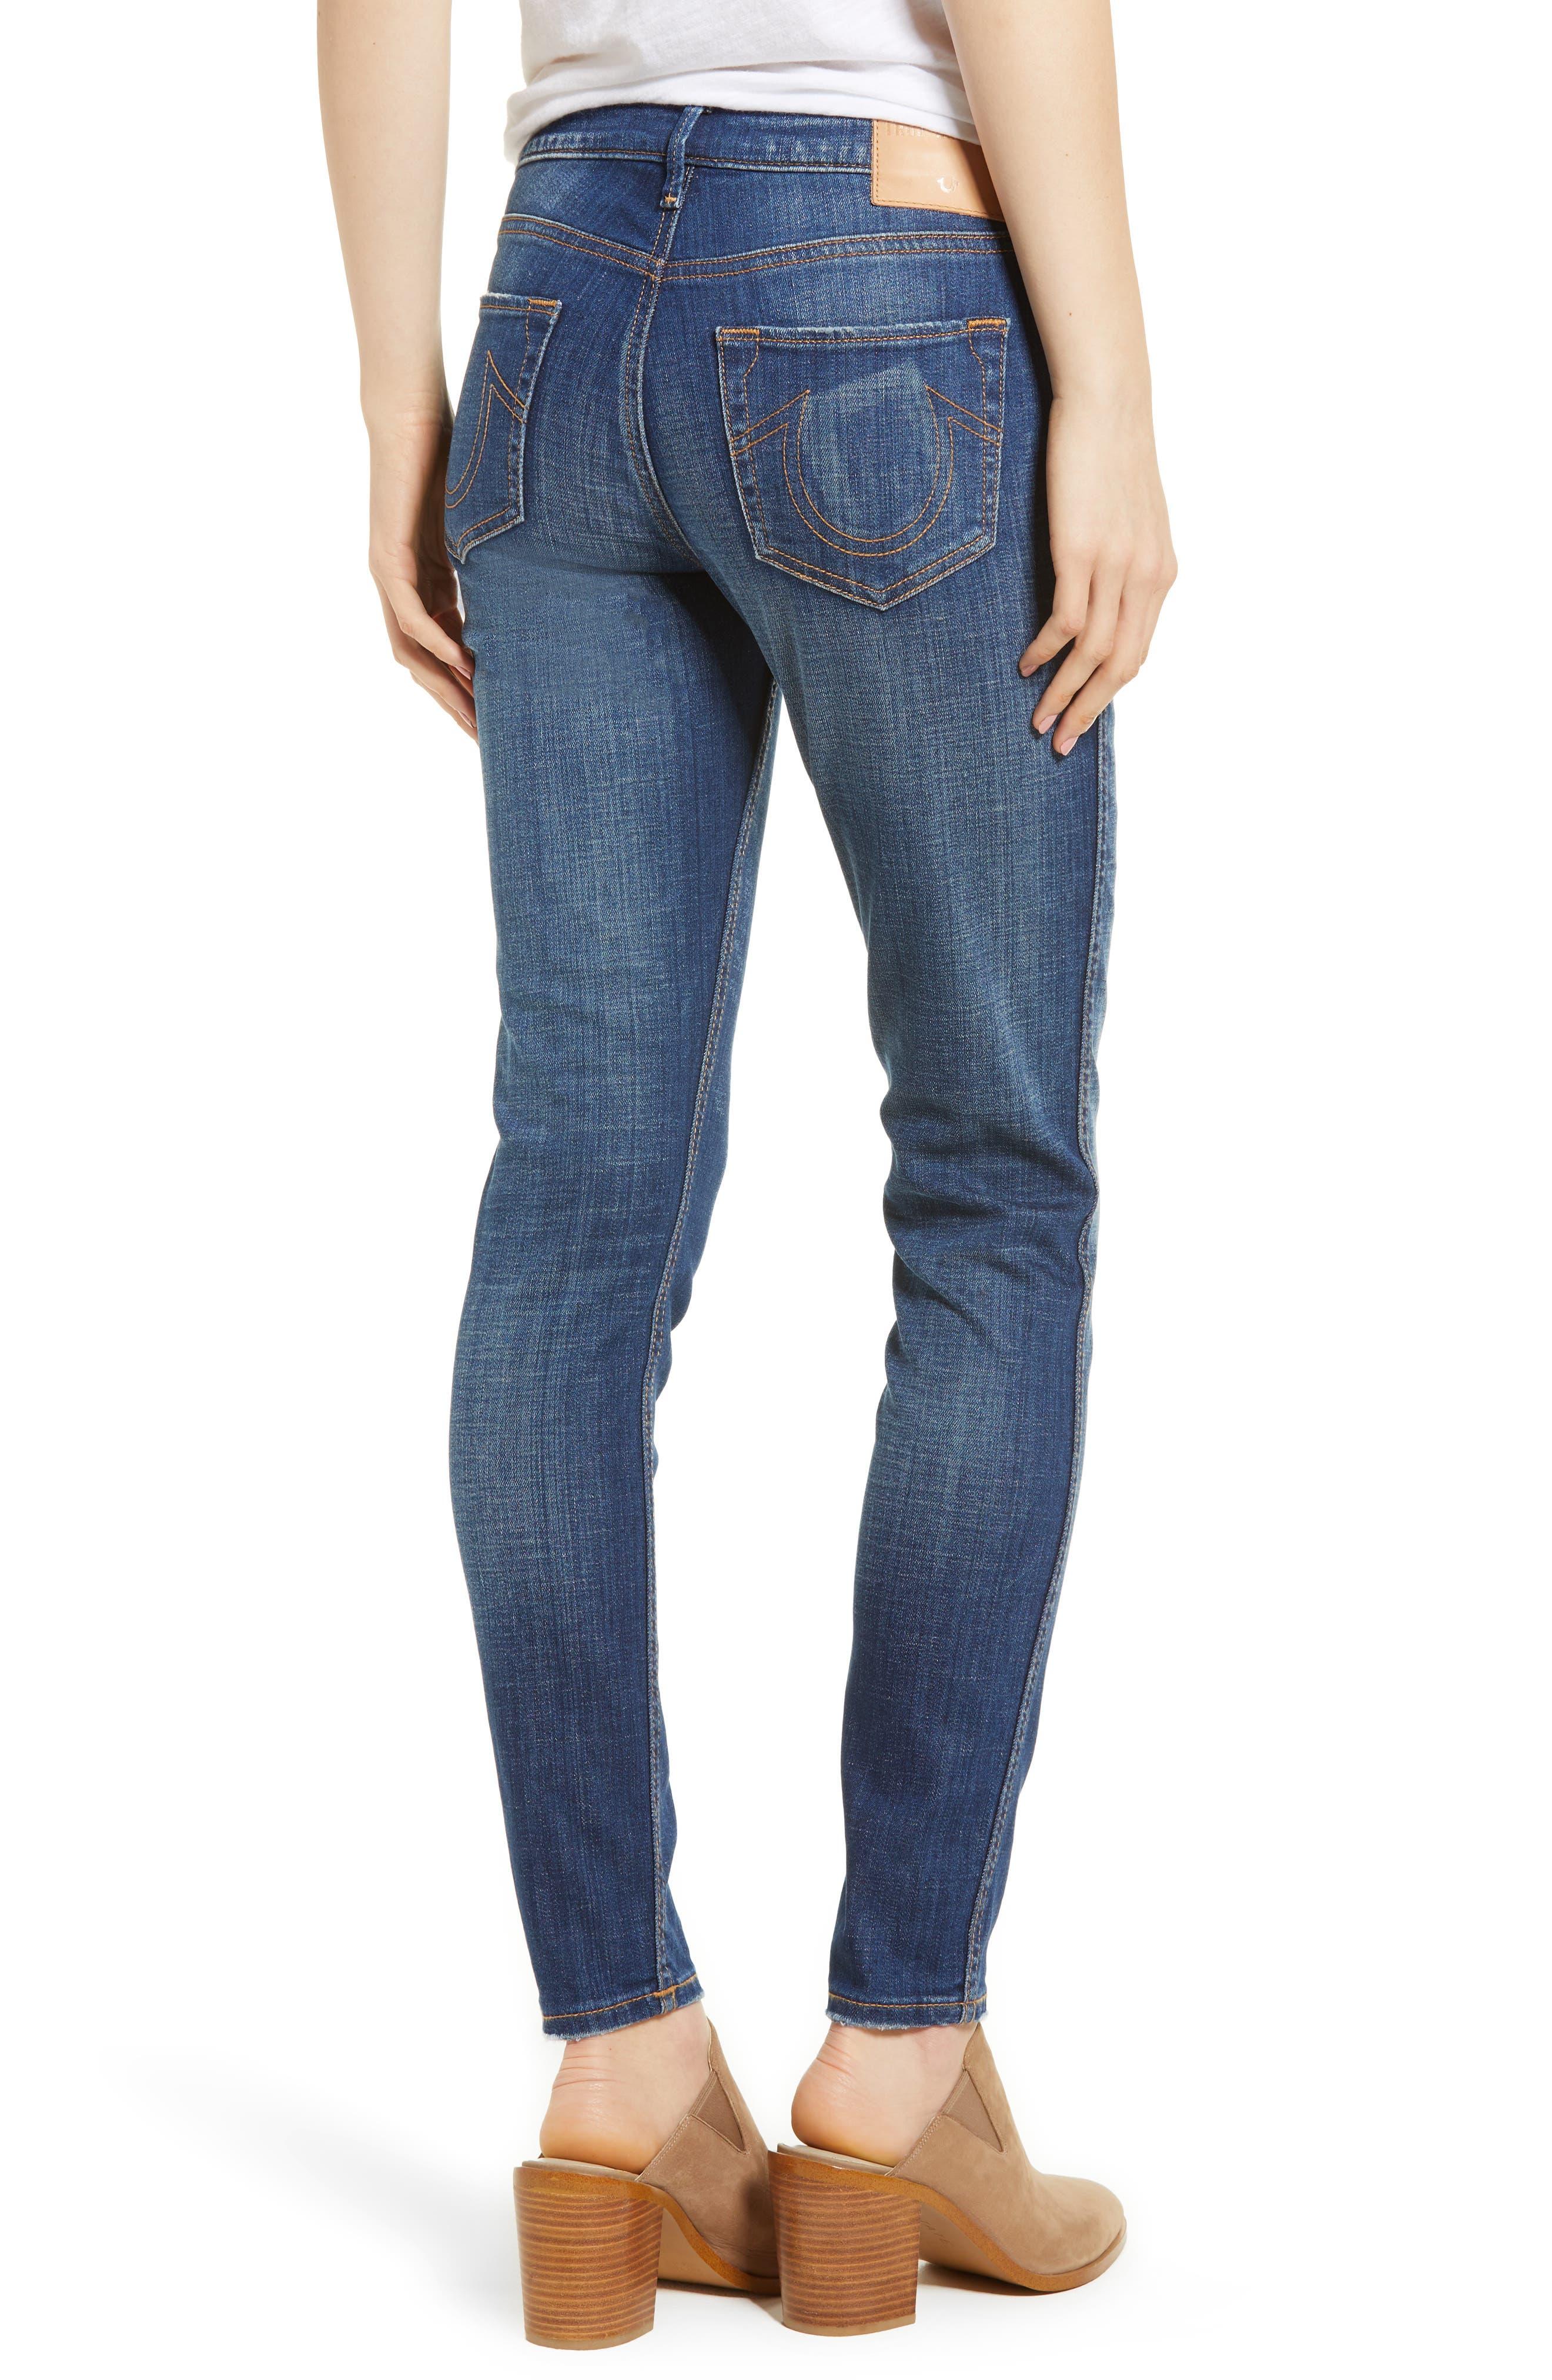 Halle Mid Rise Super Skinny Jeans,                             Alternate thumbnail 2, color,                             Esqm Gen Y